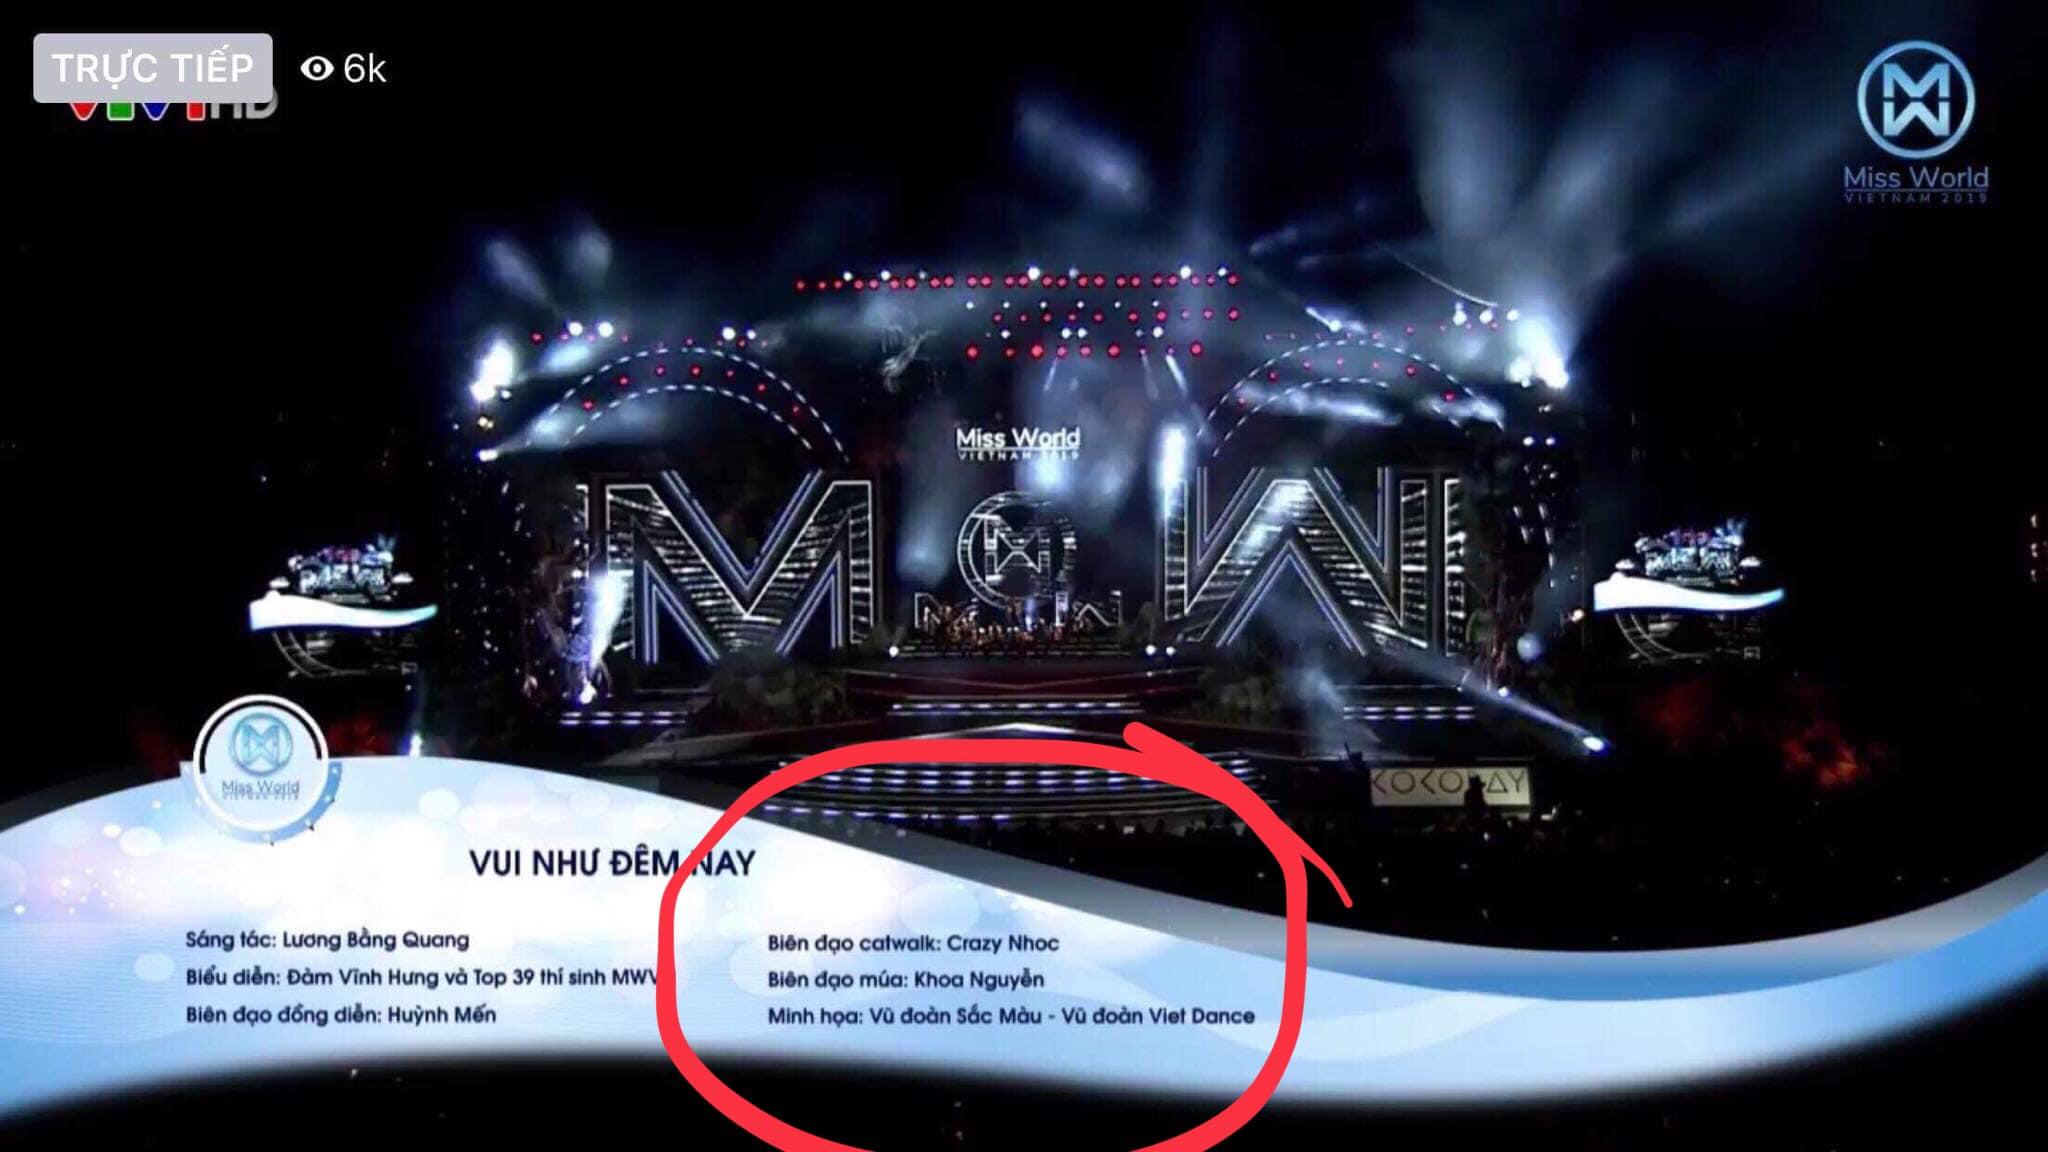 "dam vinh hung phai len tieng xin loi vi su co ""ngo ngan"" o dem chung ket miss world vn - 3"